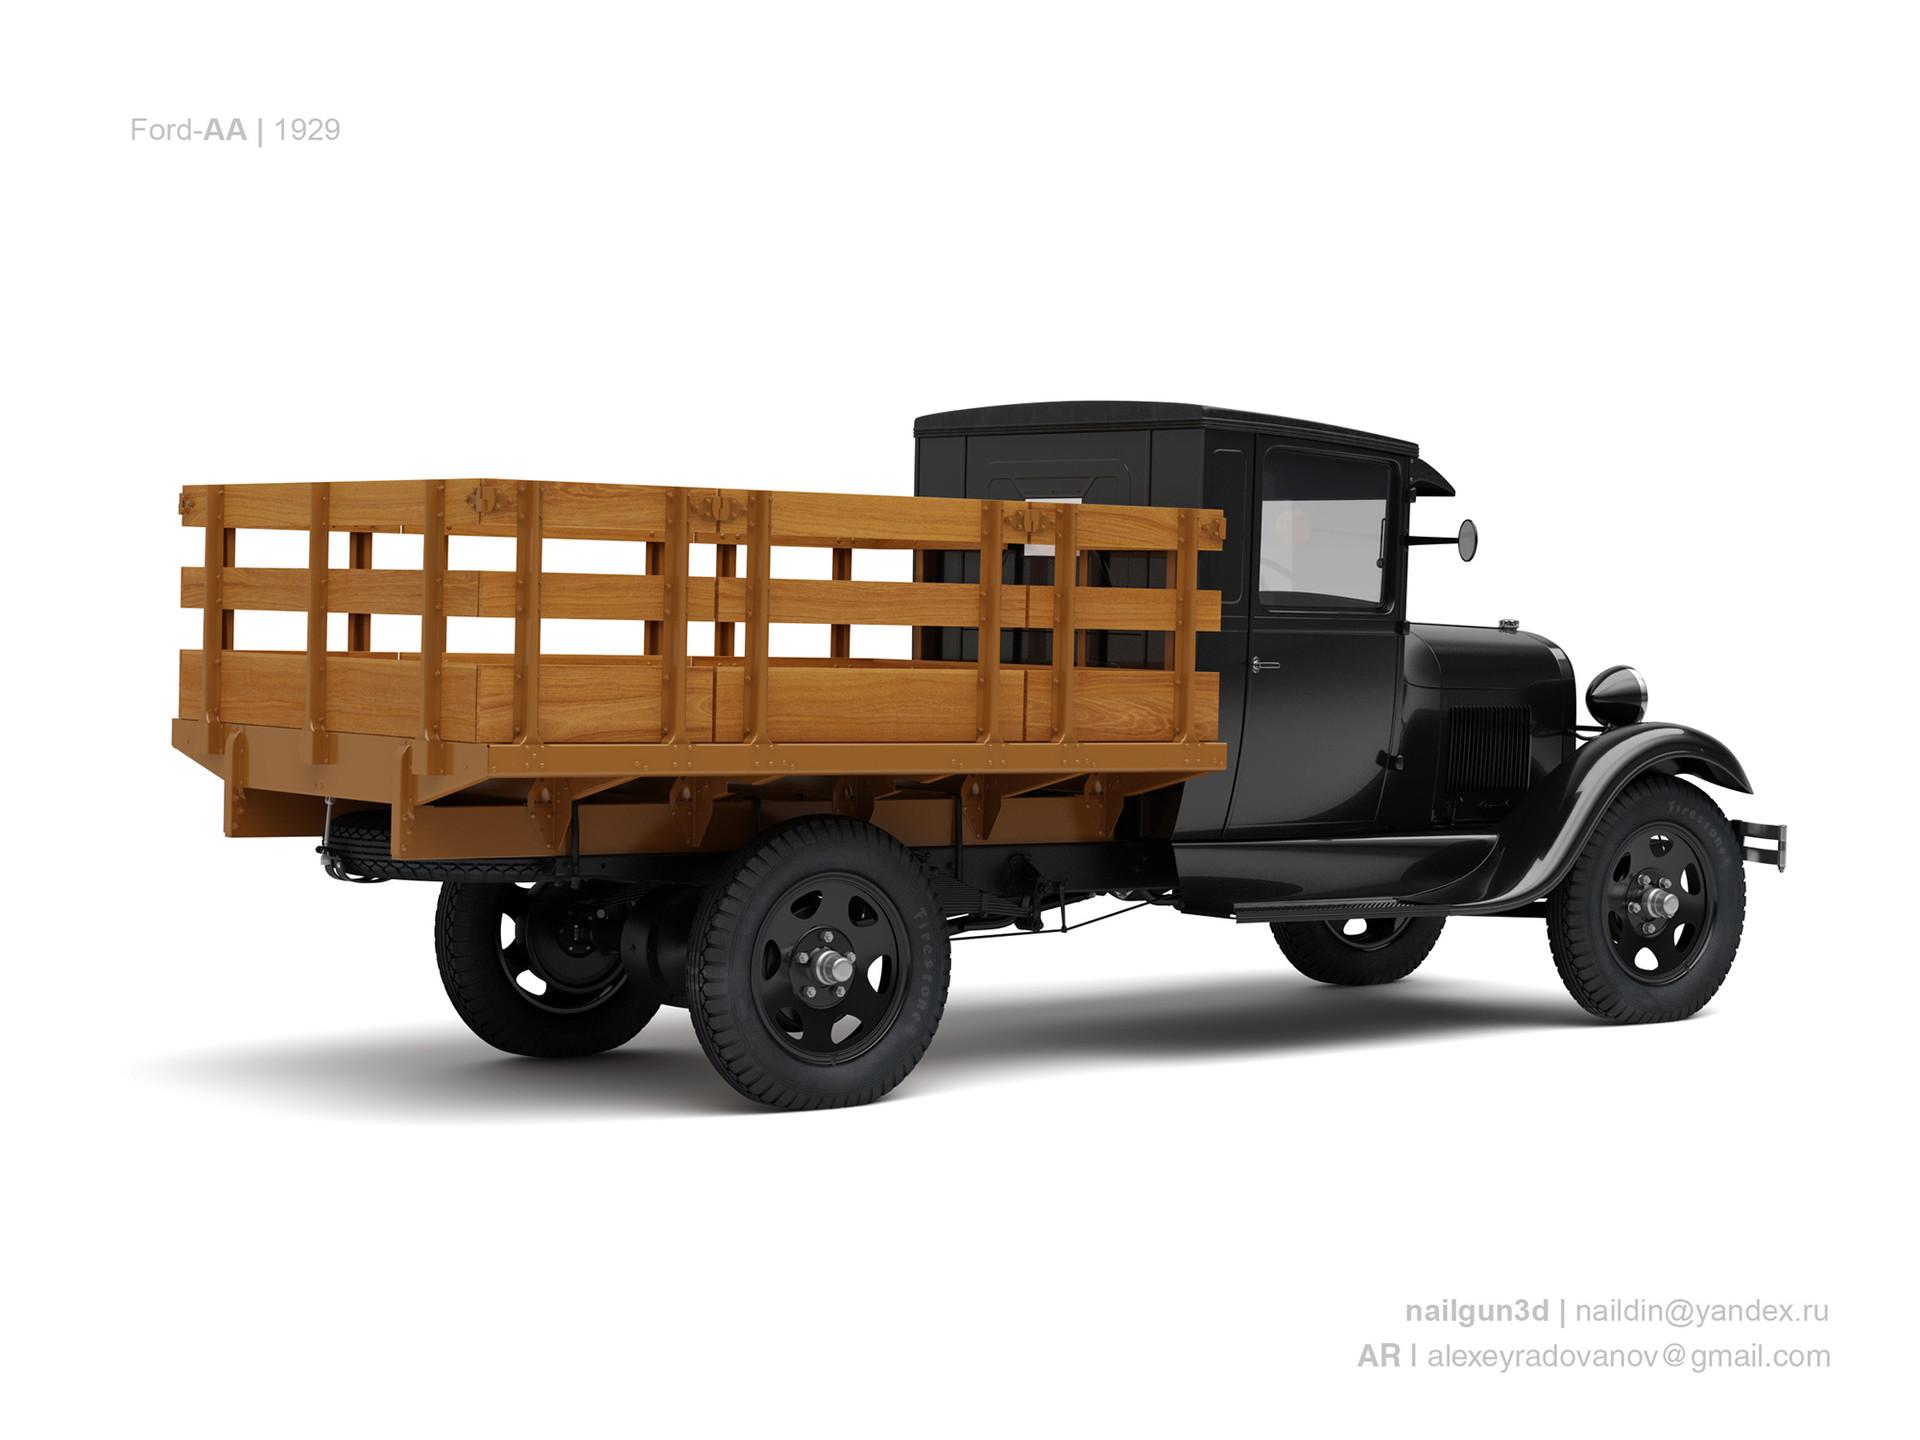 Nail khusnutdinov usa ford aa 1929 1